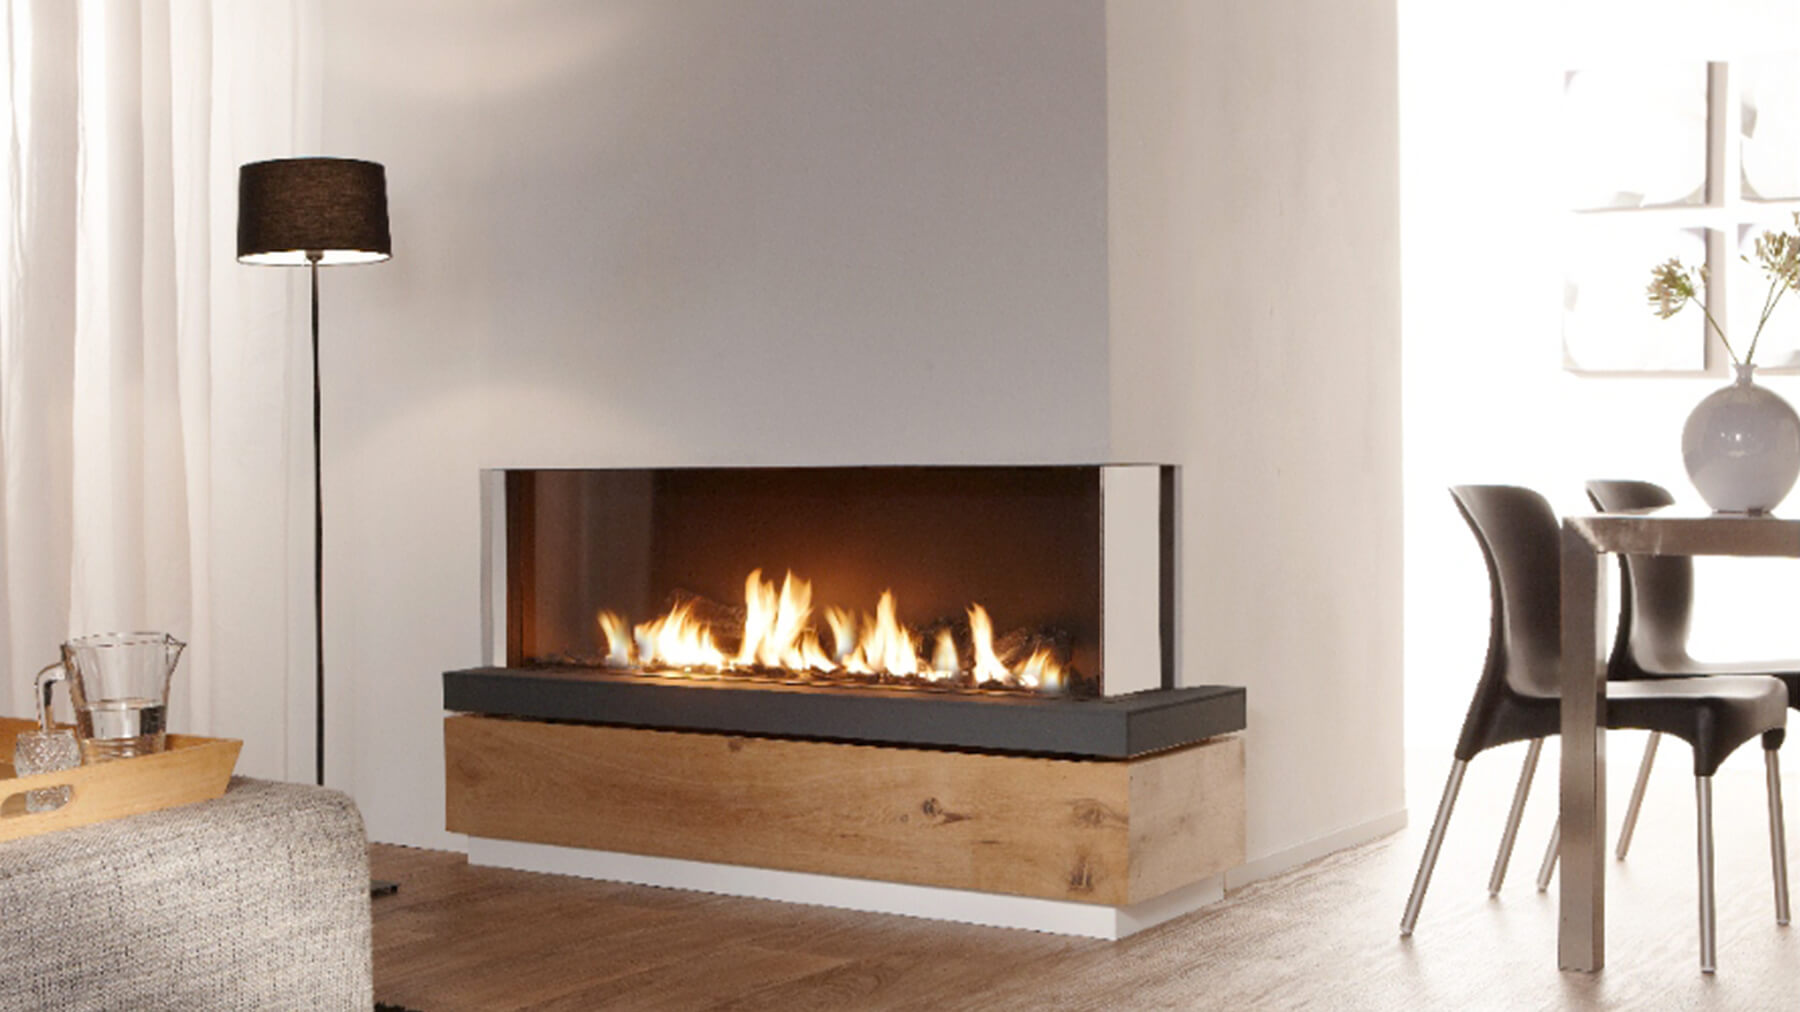 High Efficiency Corner Fireplace I Balanced Flue Gas Fire